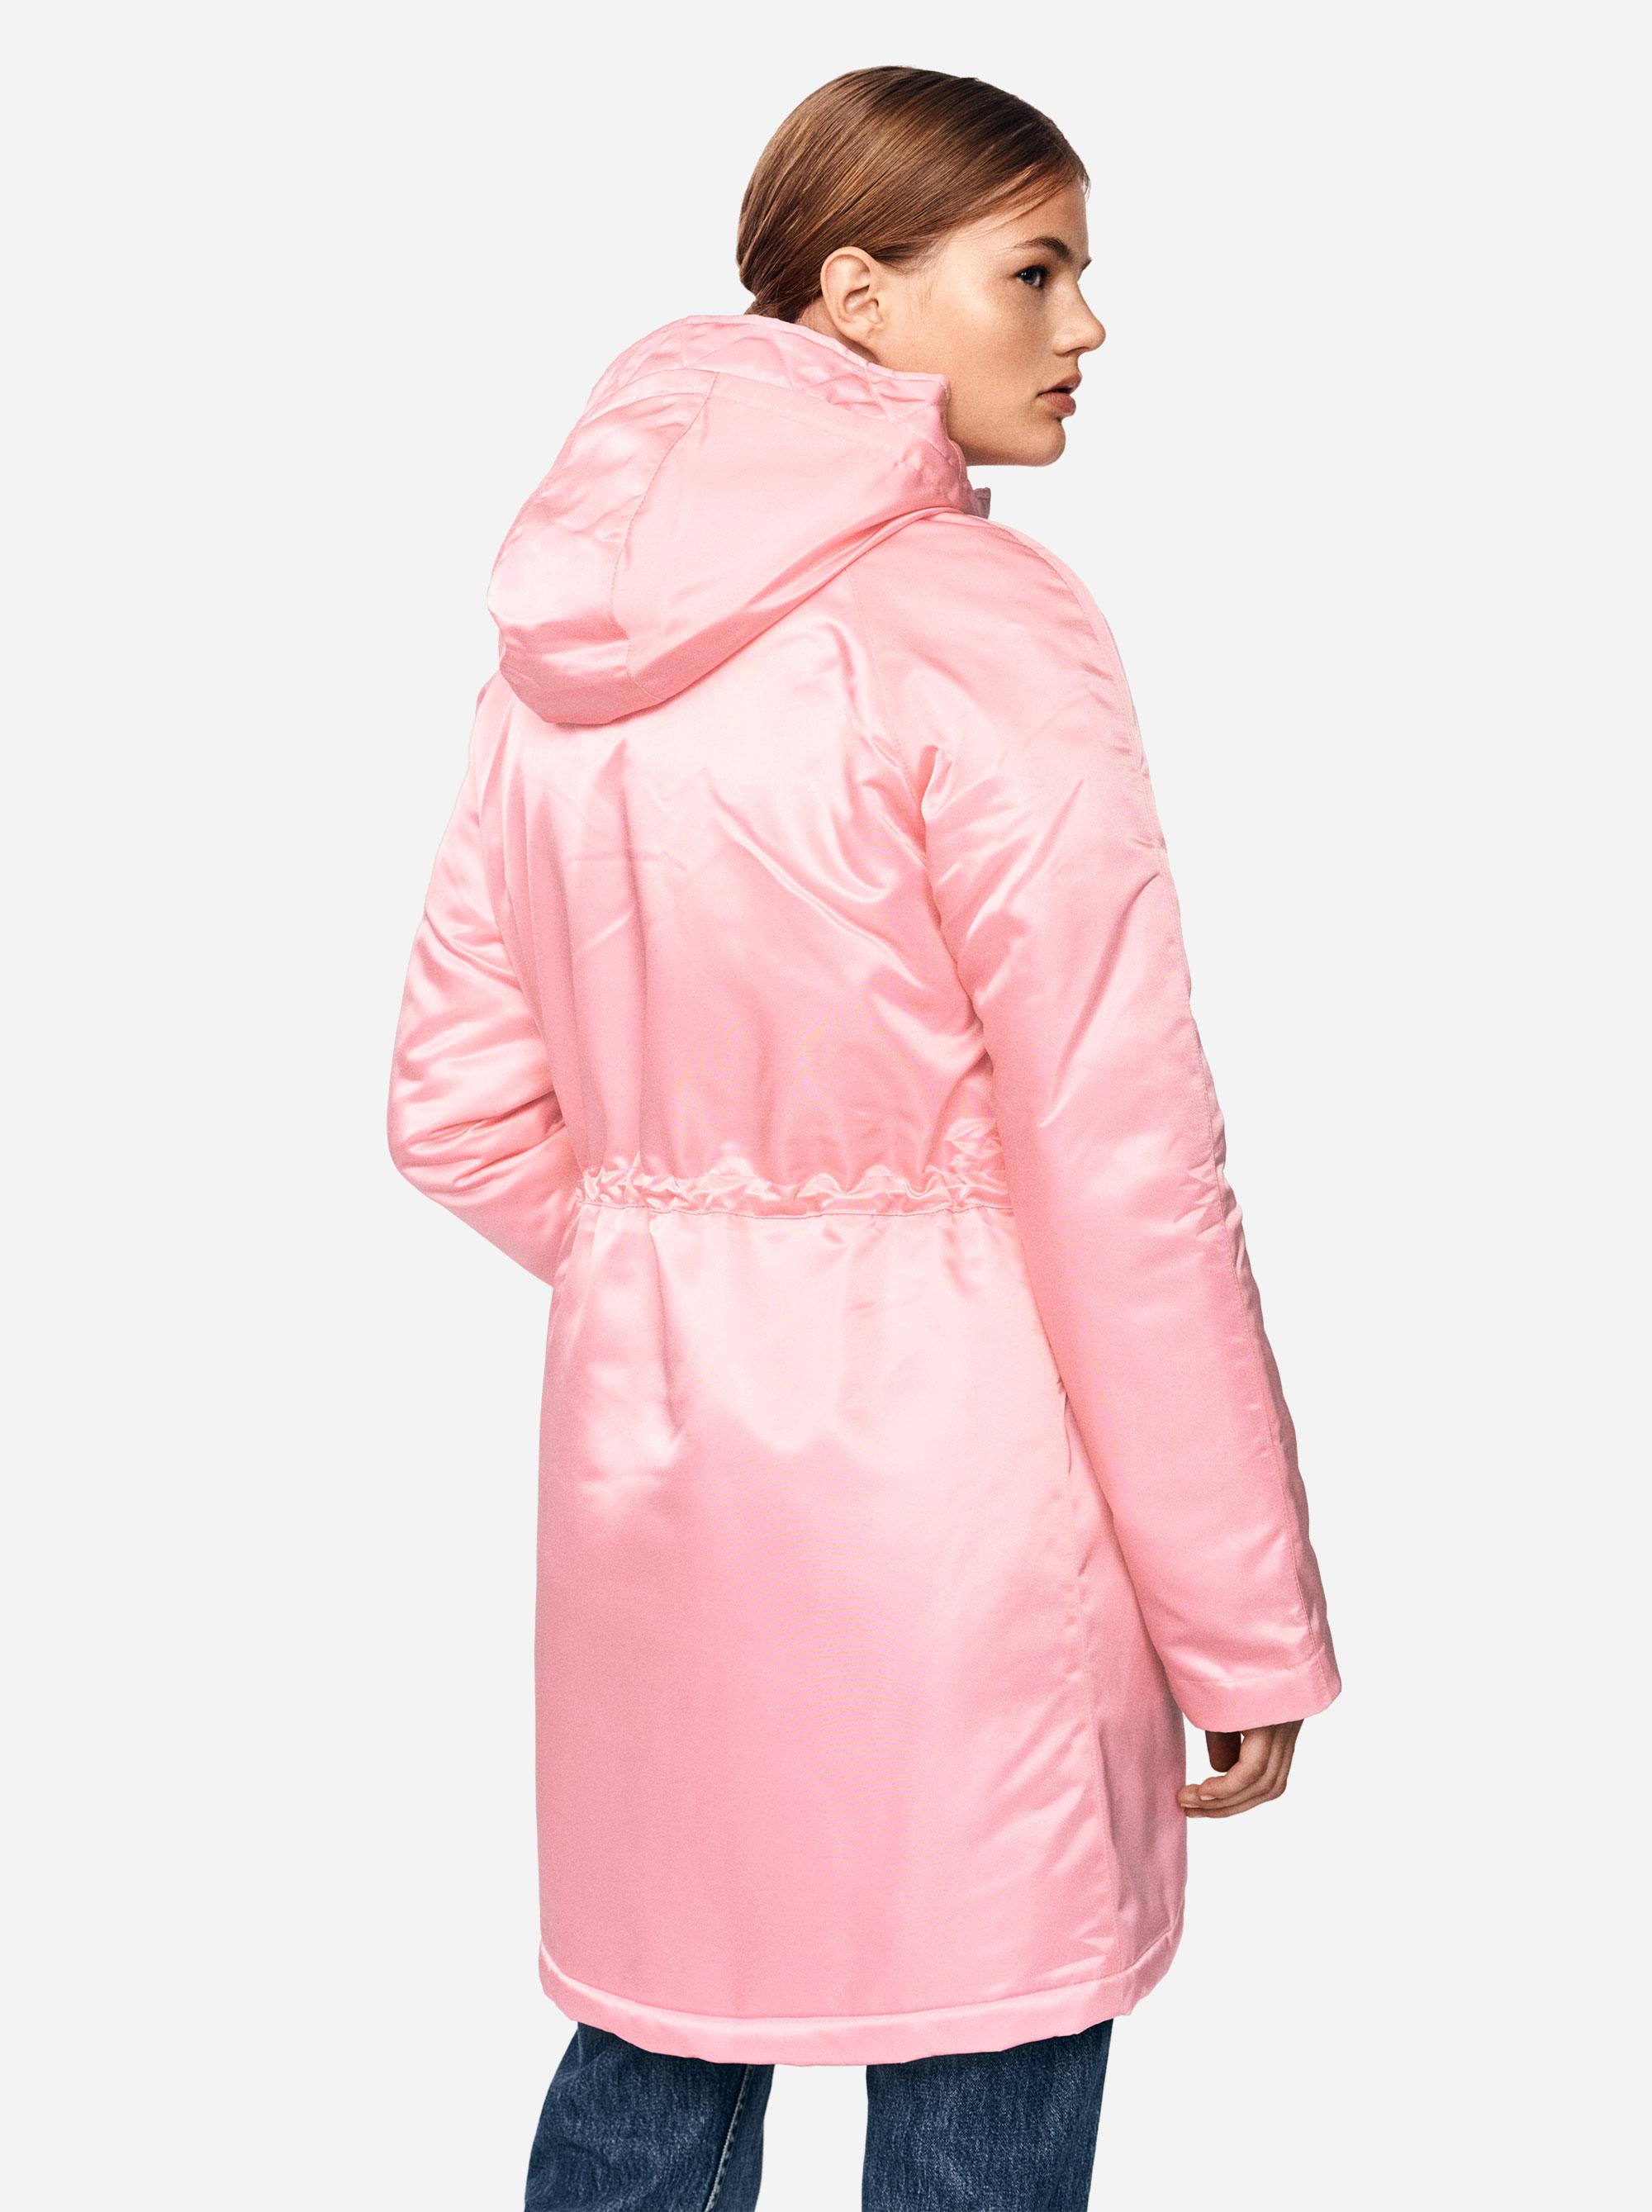 Teym - The Parka - Women - Pink - 2